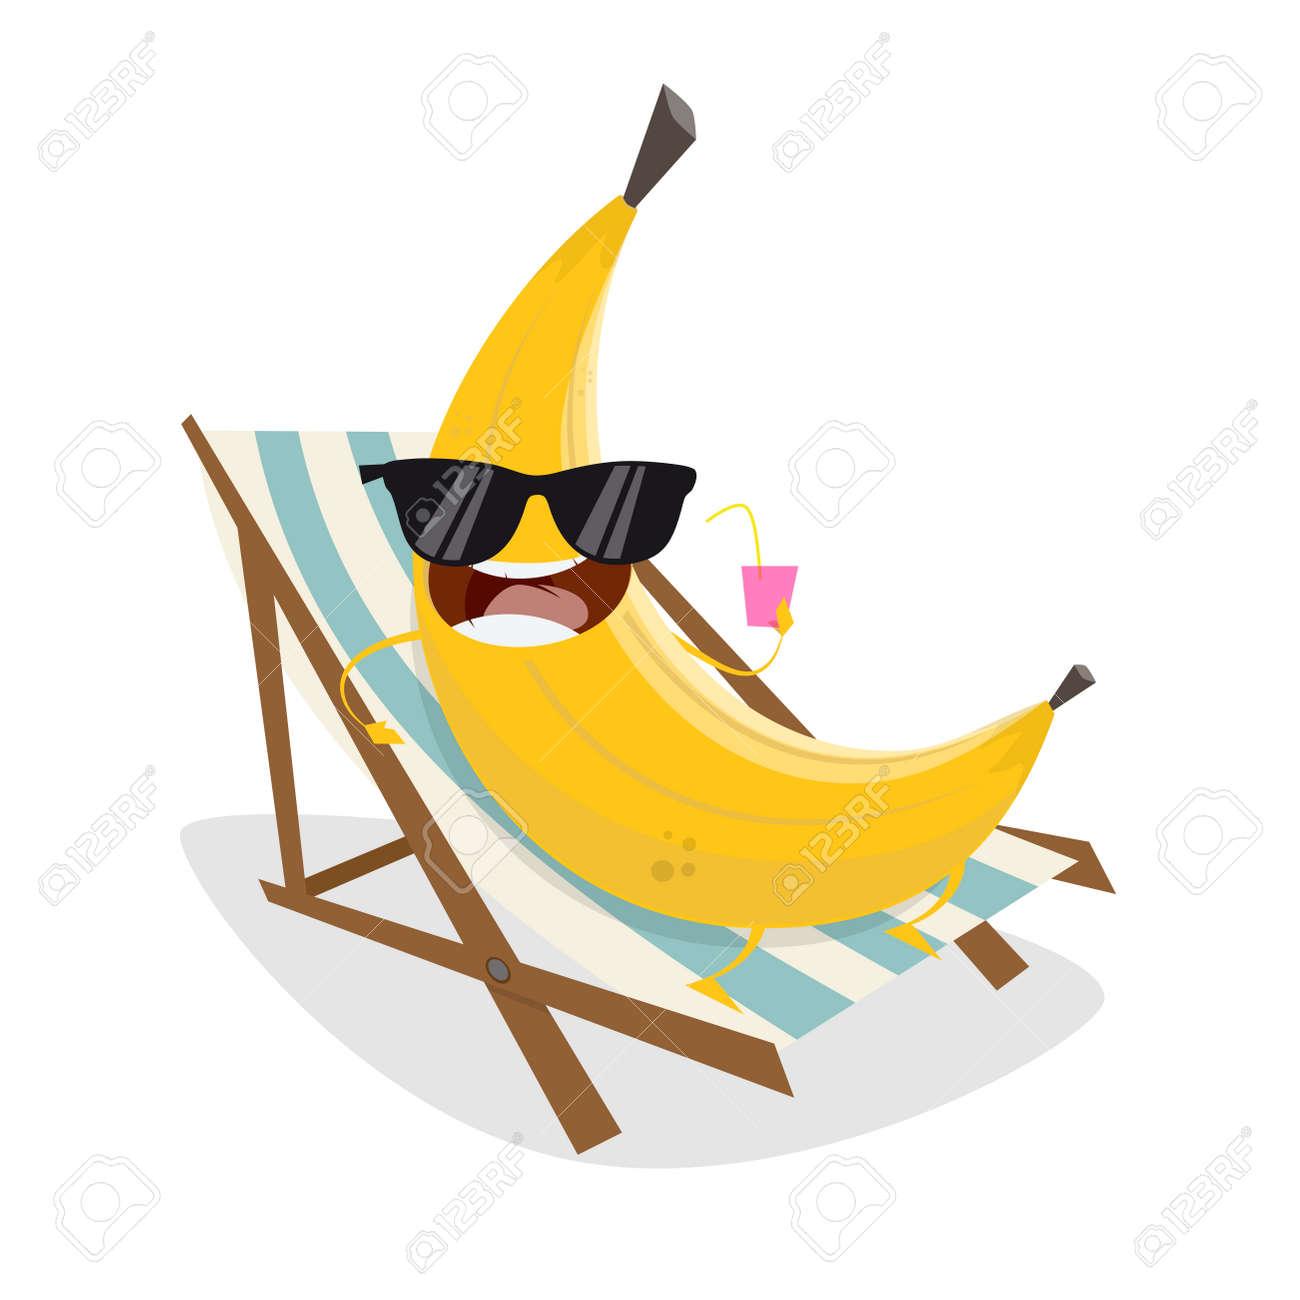 Phenomenal Funny Cartoon Banana Relaxing On Sunbed Download Free Architecture Designs Scobabritishbridgeorg